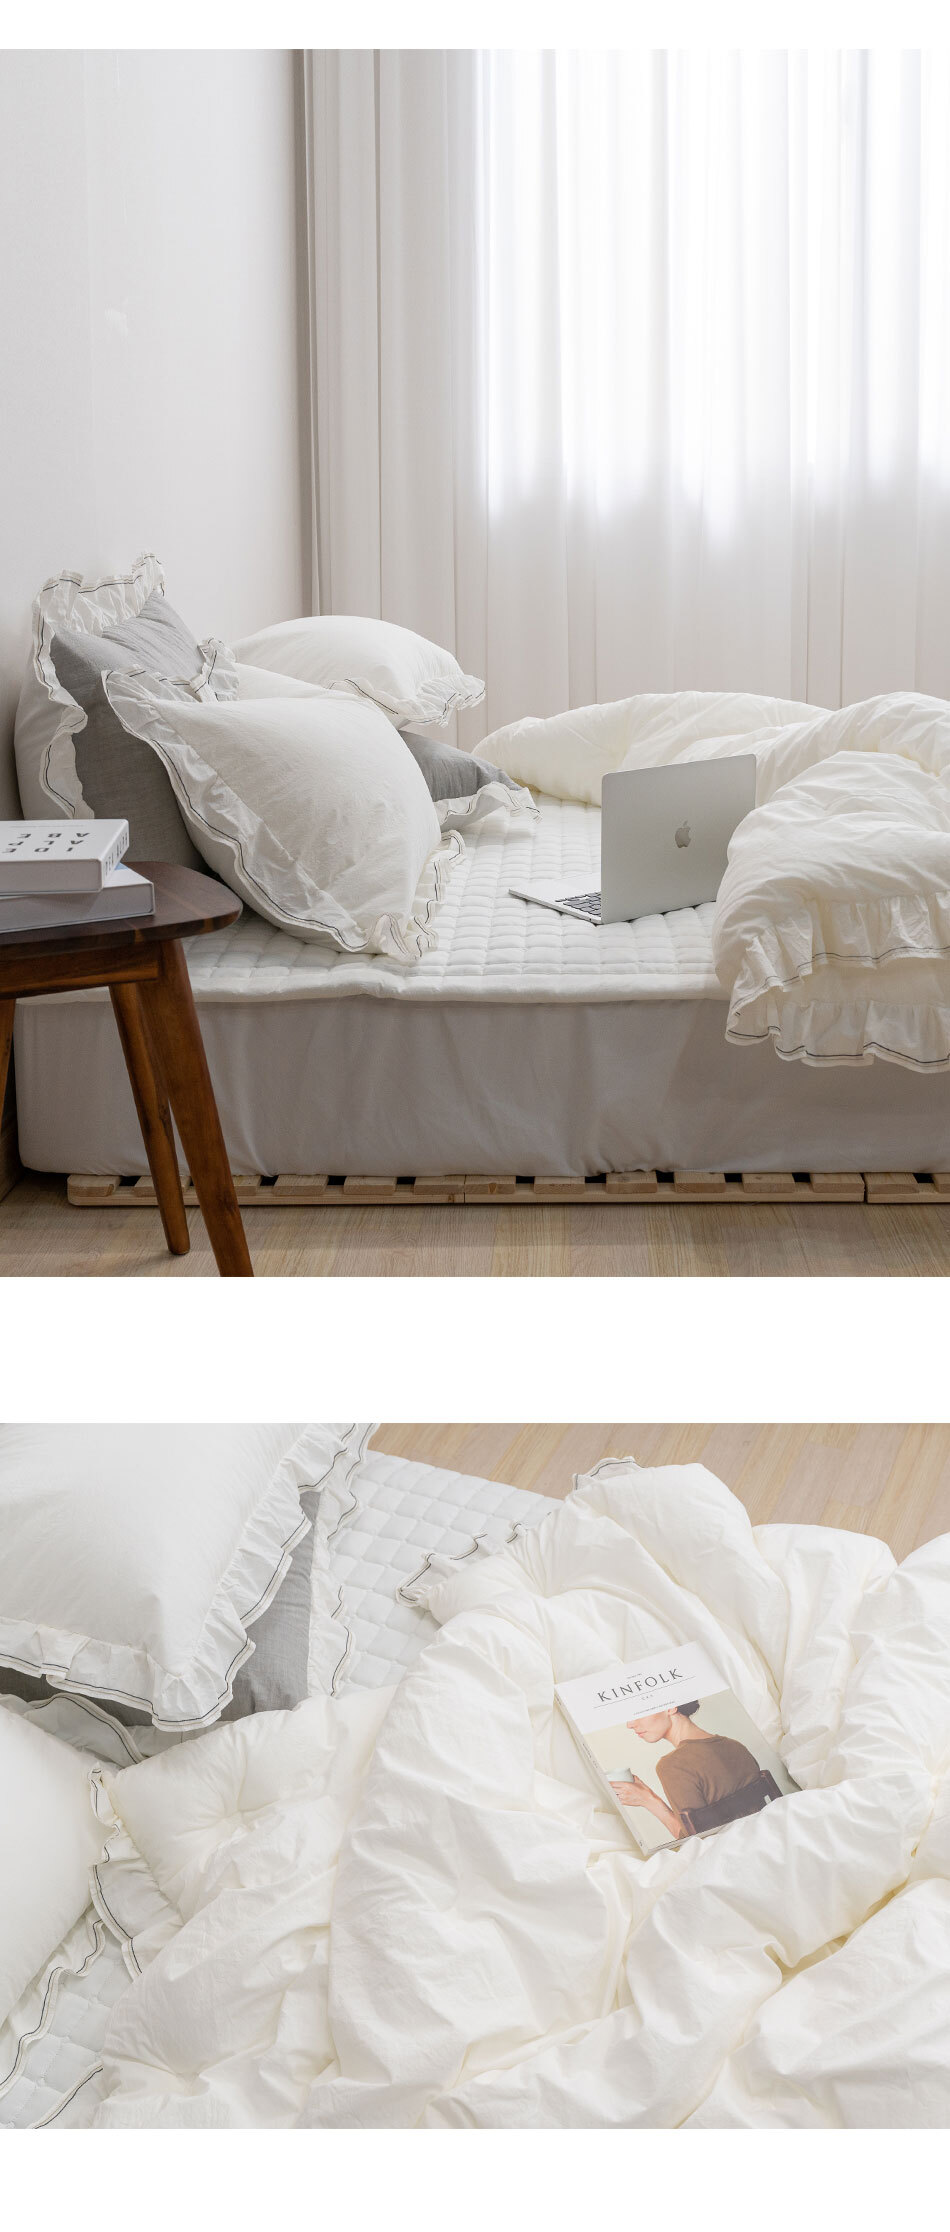 stay_bed_white4.jpg